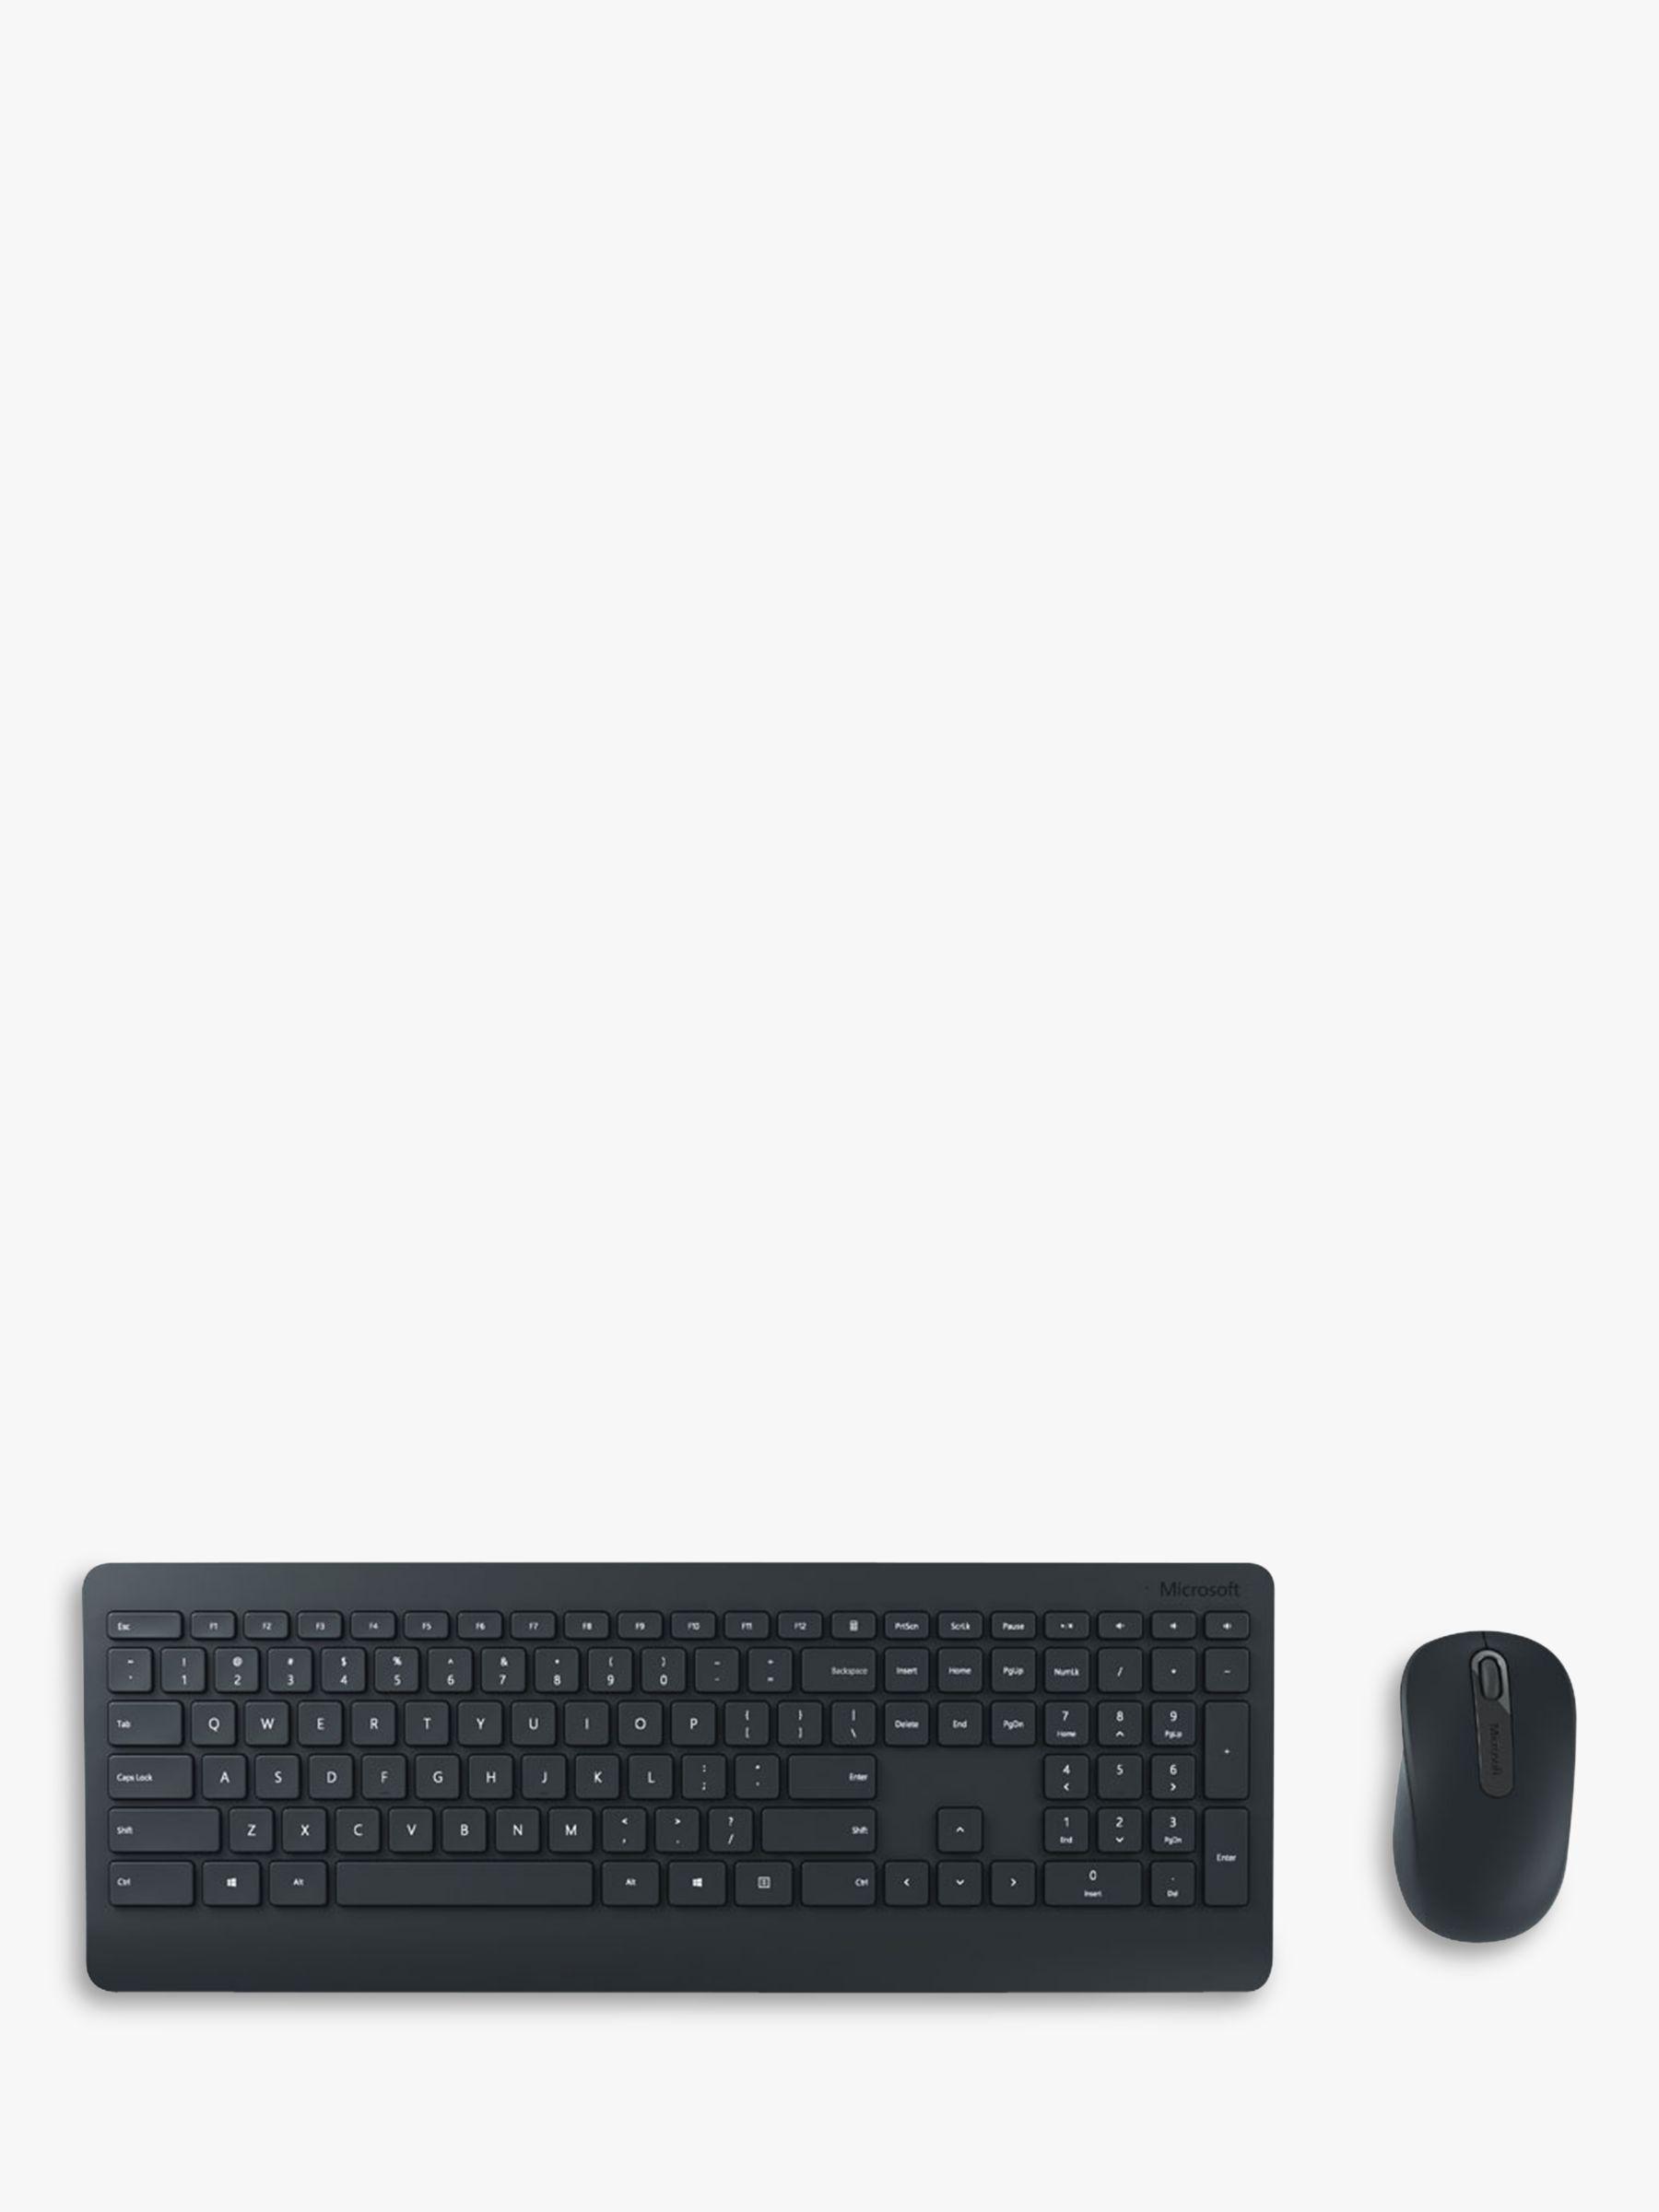 Microsoft Microsoft 900 Wireless Desktop Keyboard and Mouse, Black